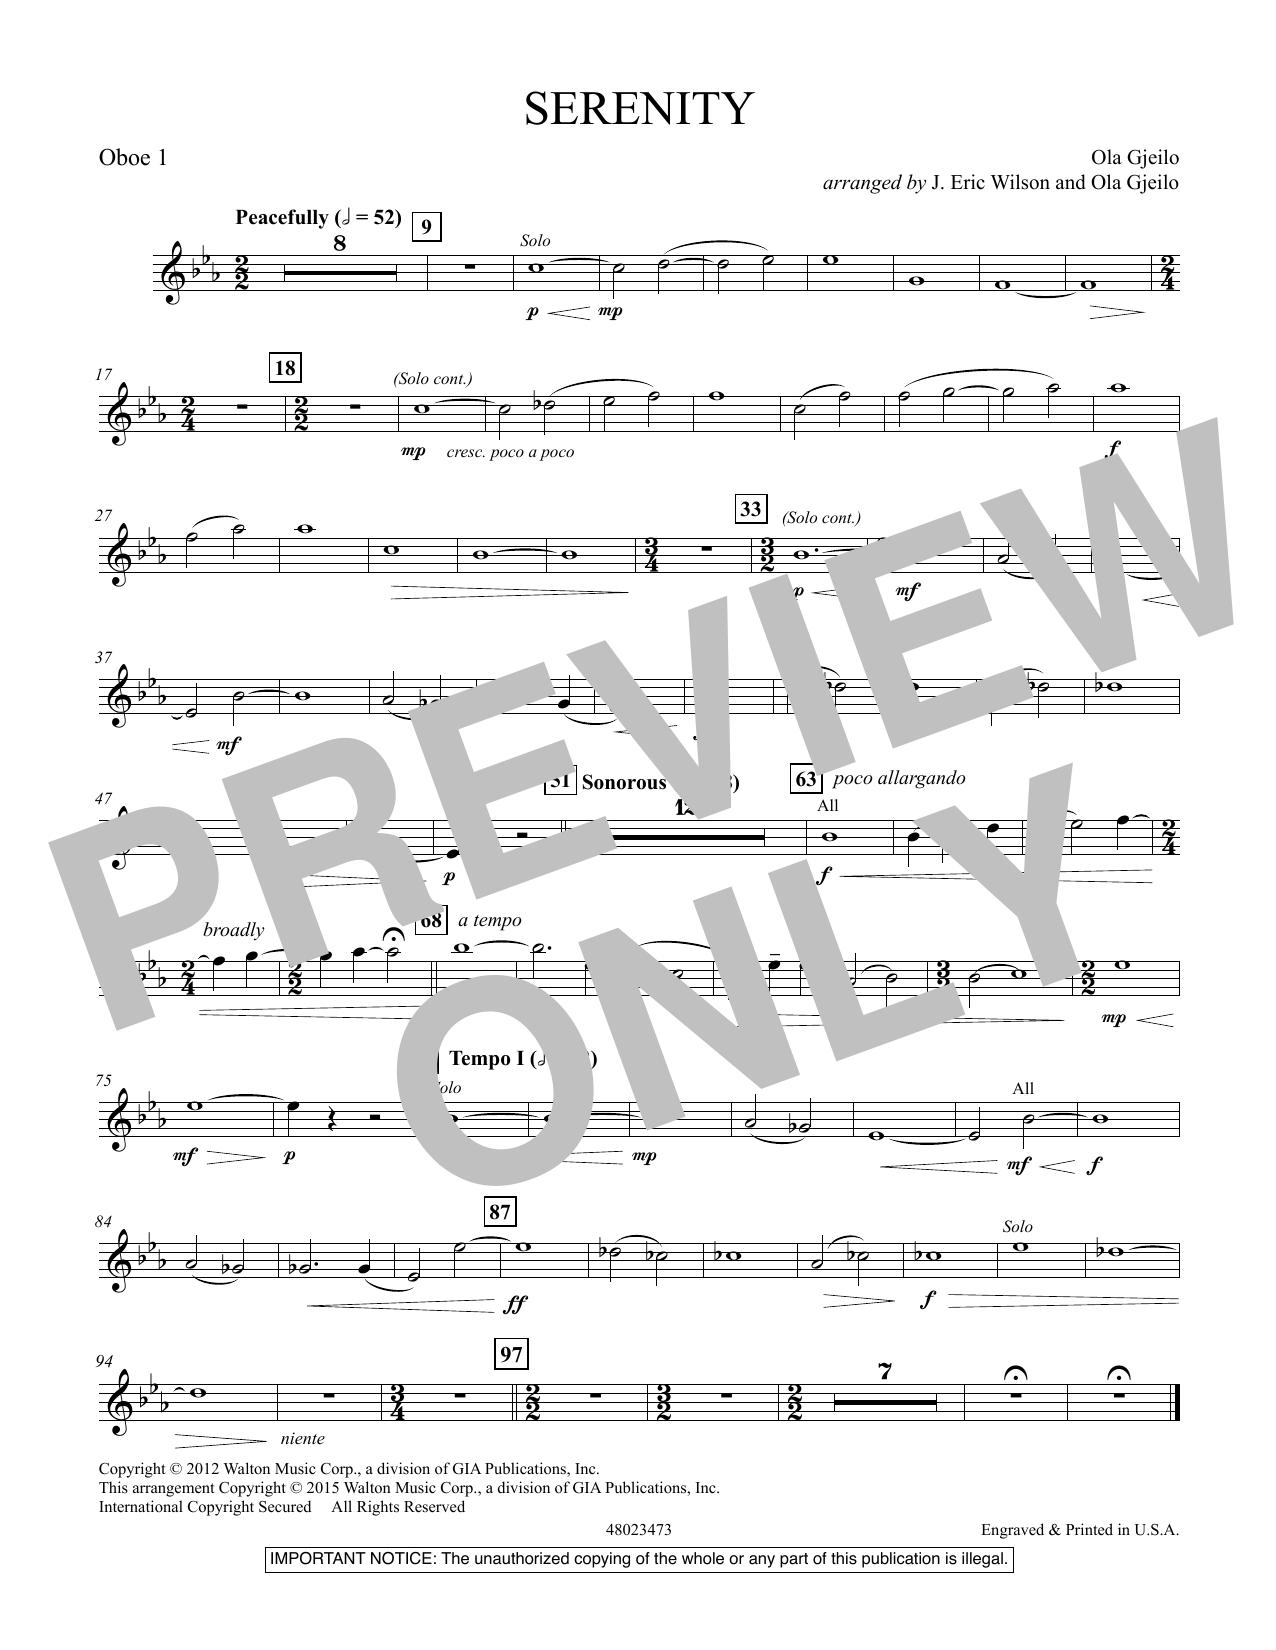 Serenity - Oboe 1 (Concert Band)